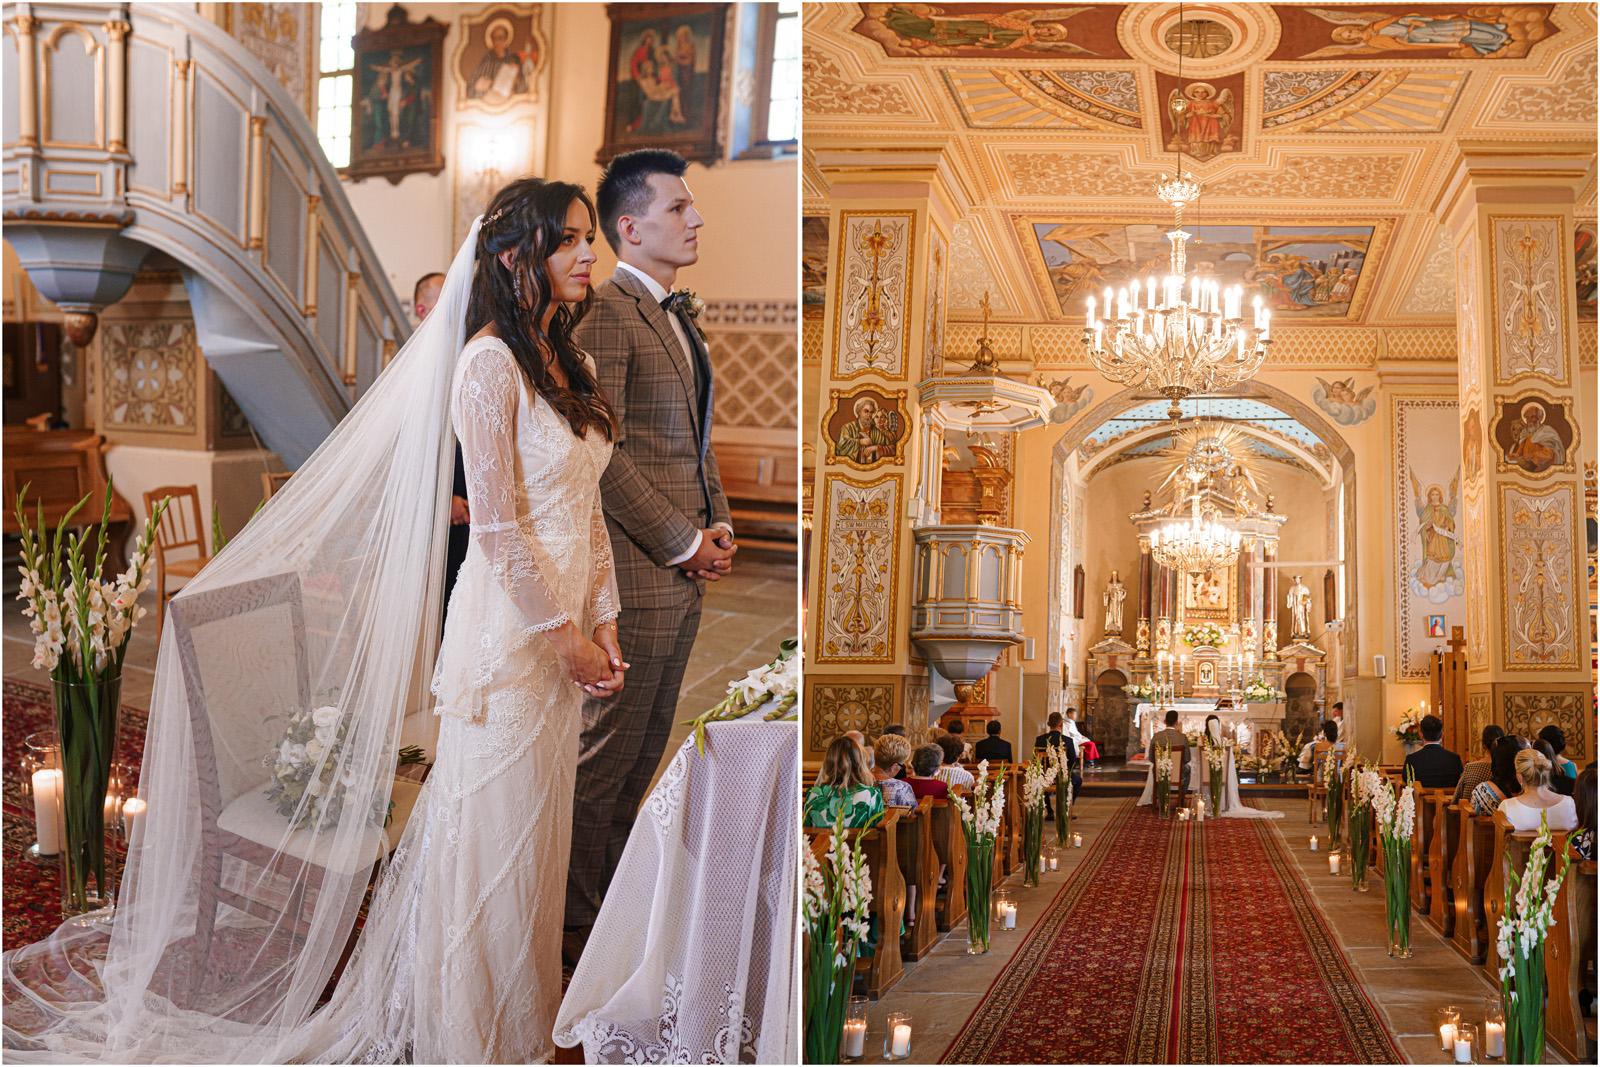 Ania & Mateusz | boho wesele w Stodole pod Kasztanami 42